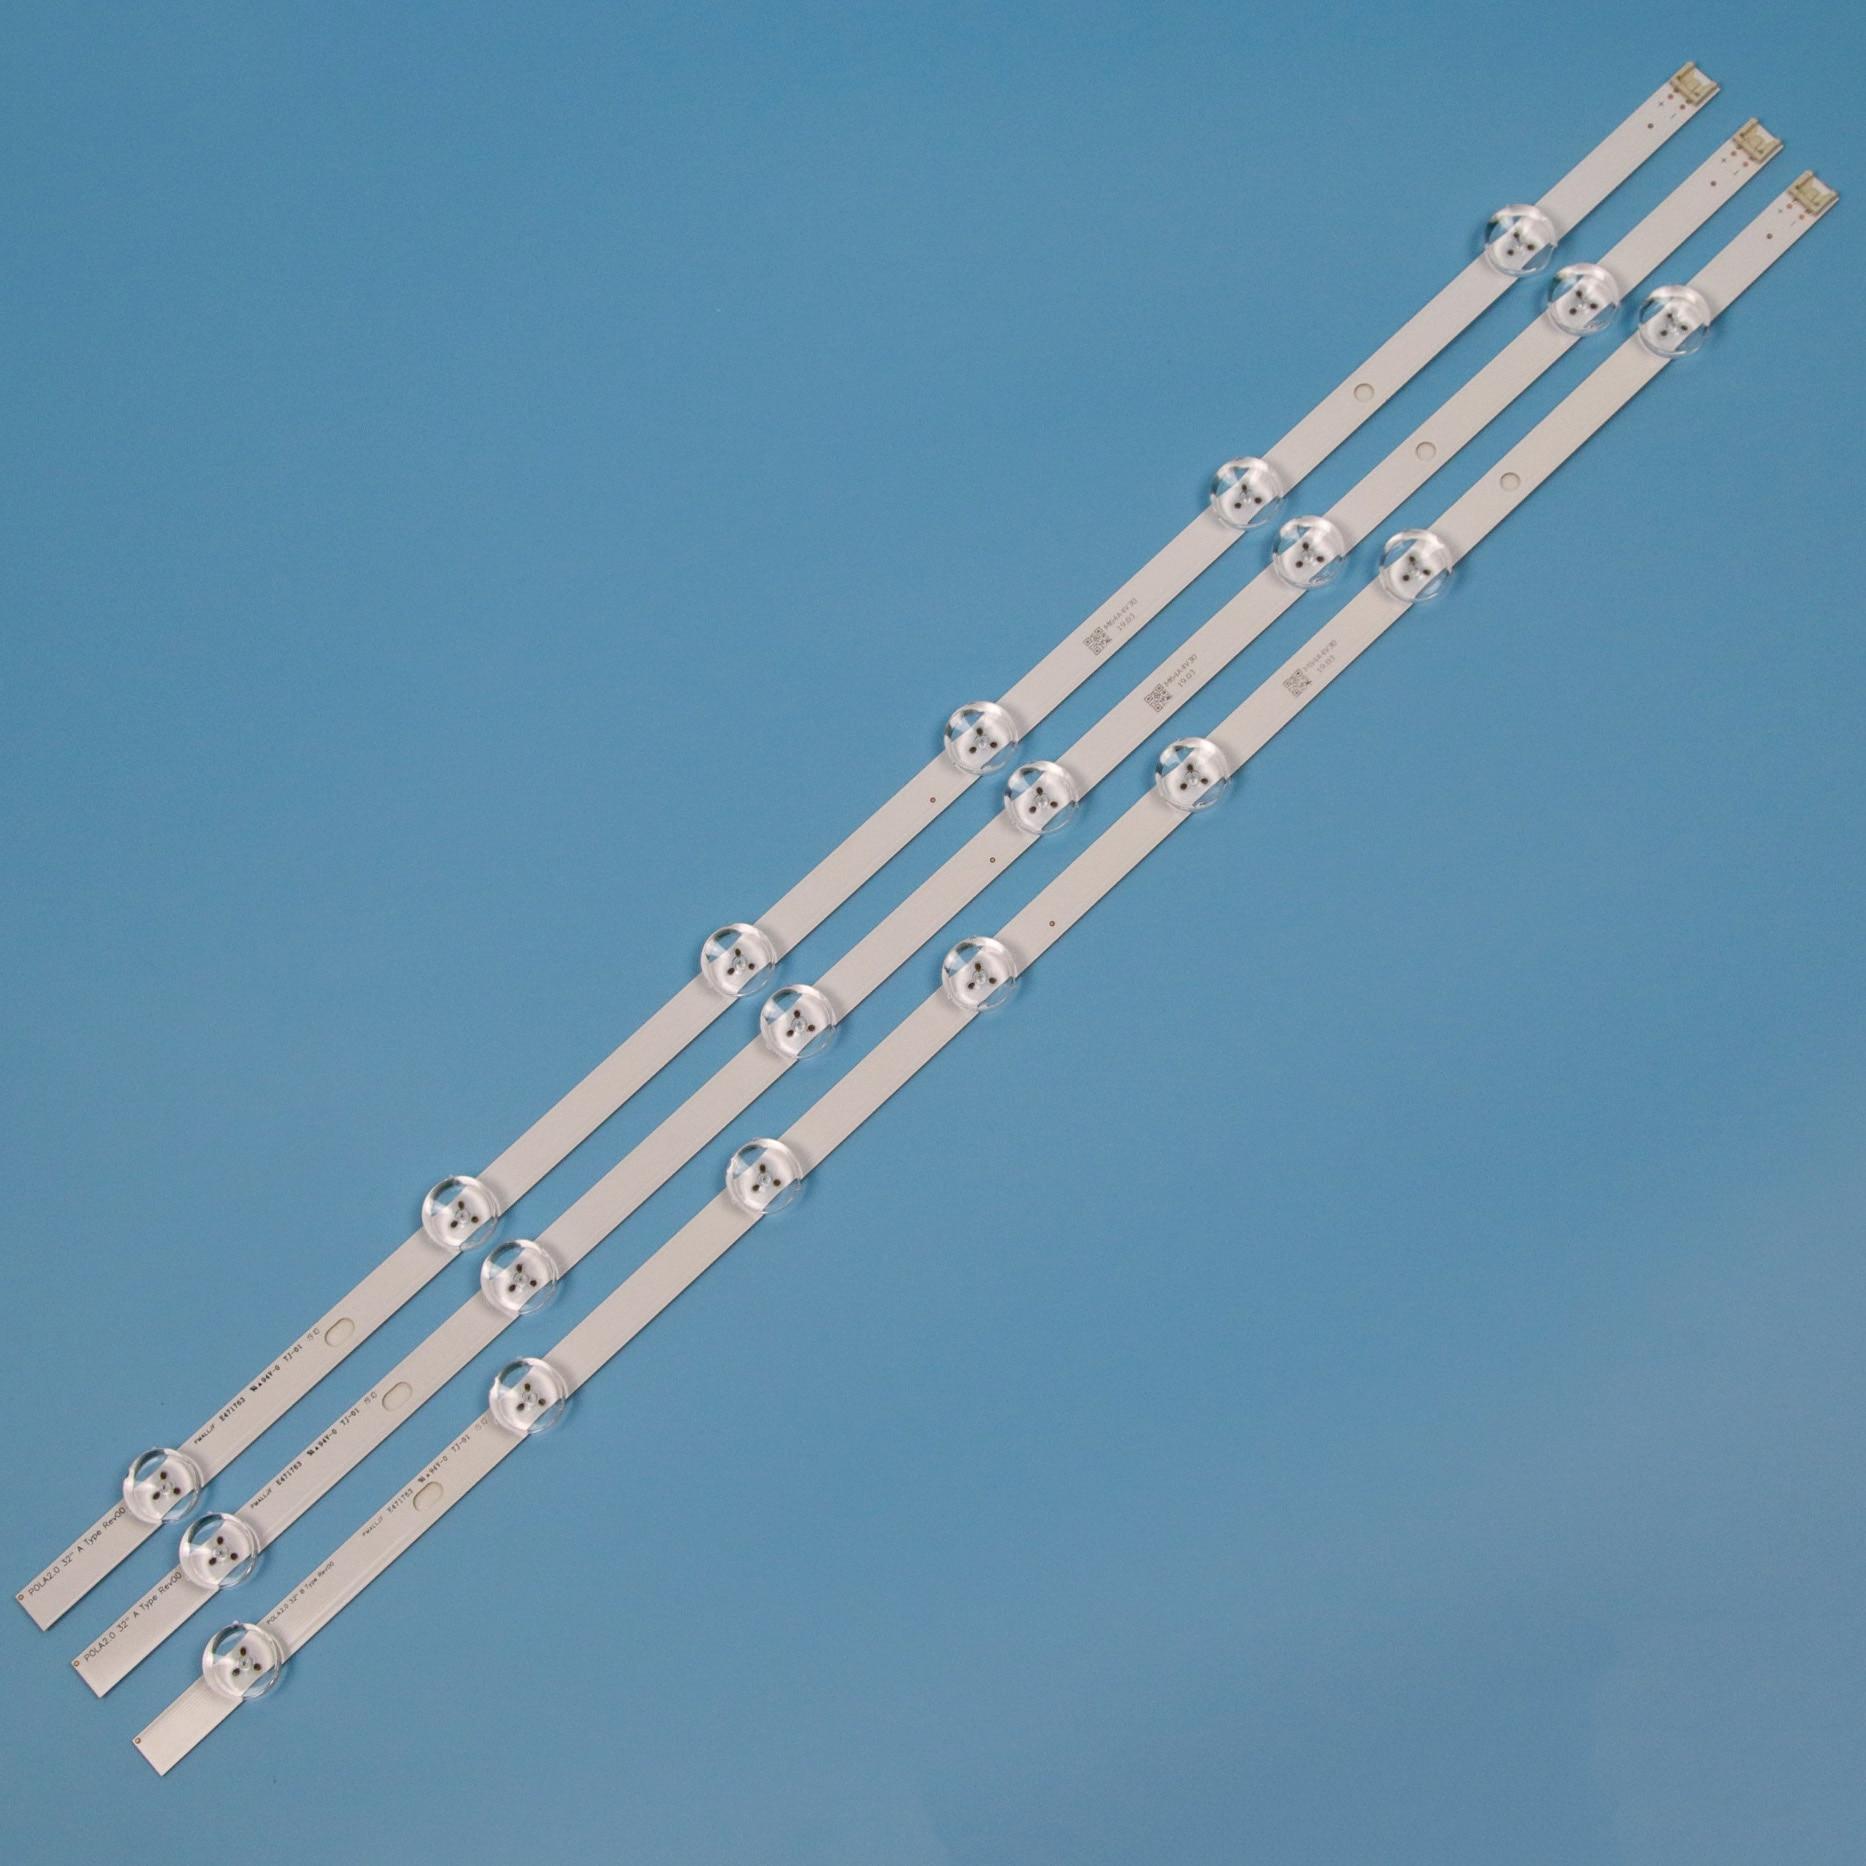 LED TV Backlight Strip For LG 32LN540B 32LN530B-UA 32LN545B LED Array Strips Kit Bars Lamp Bands HC320DXN-VSFP4-21XX VHFPA-21XX